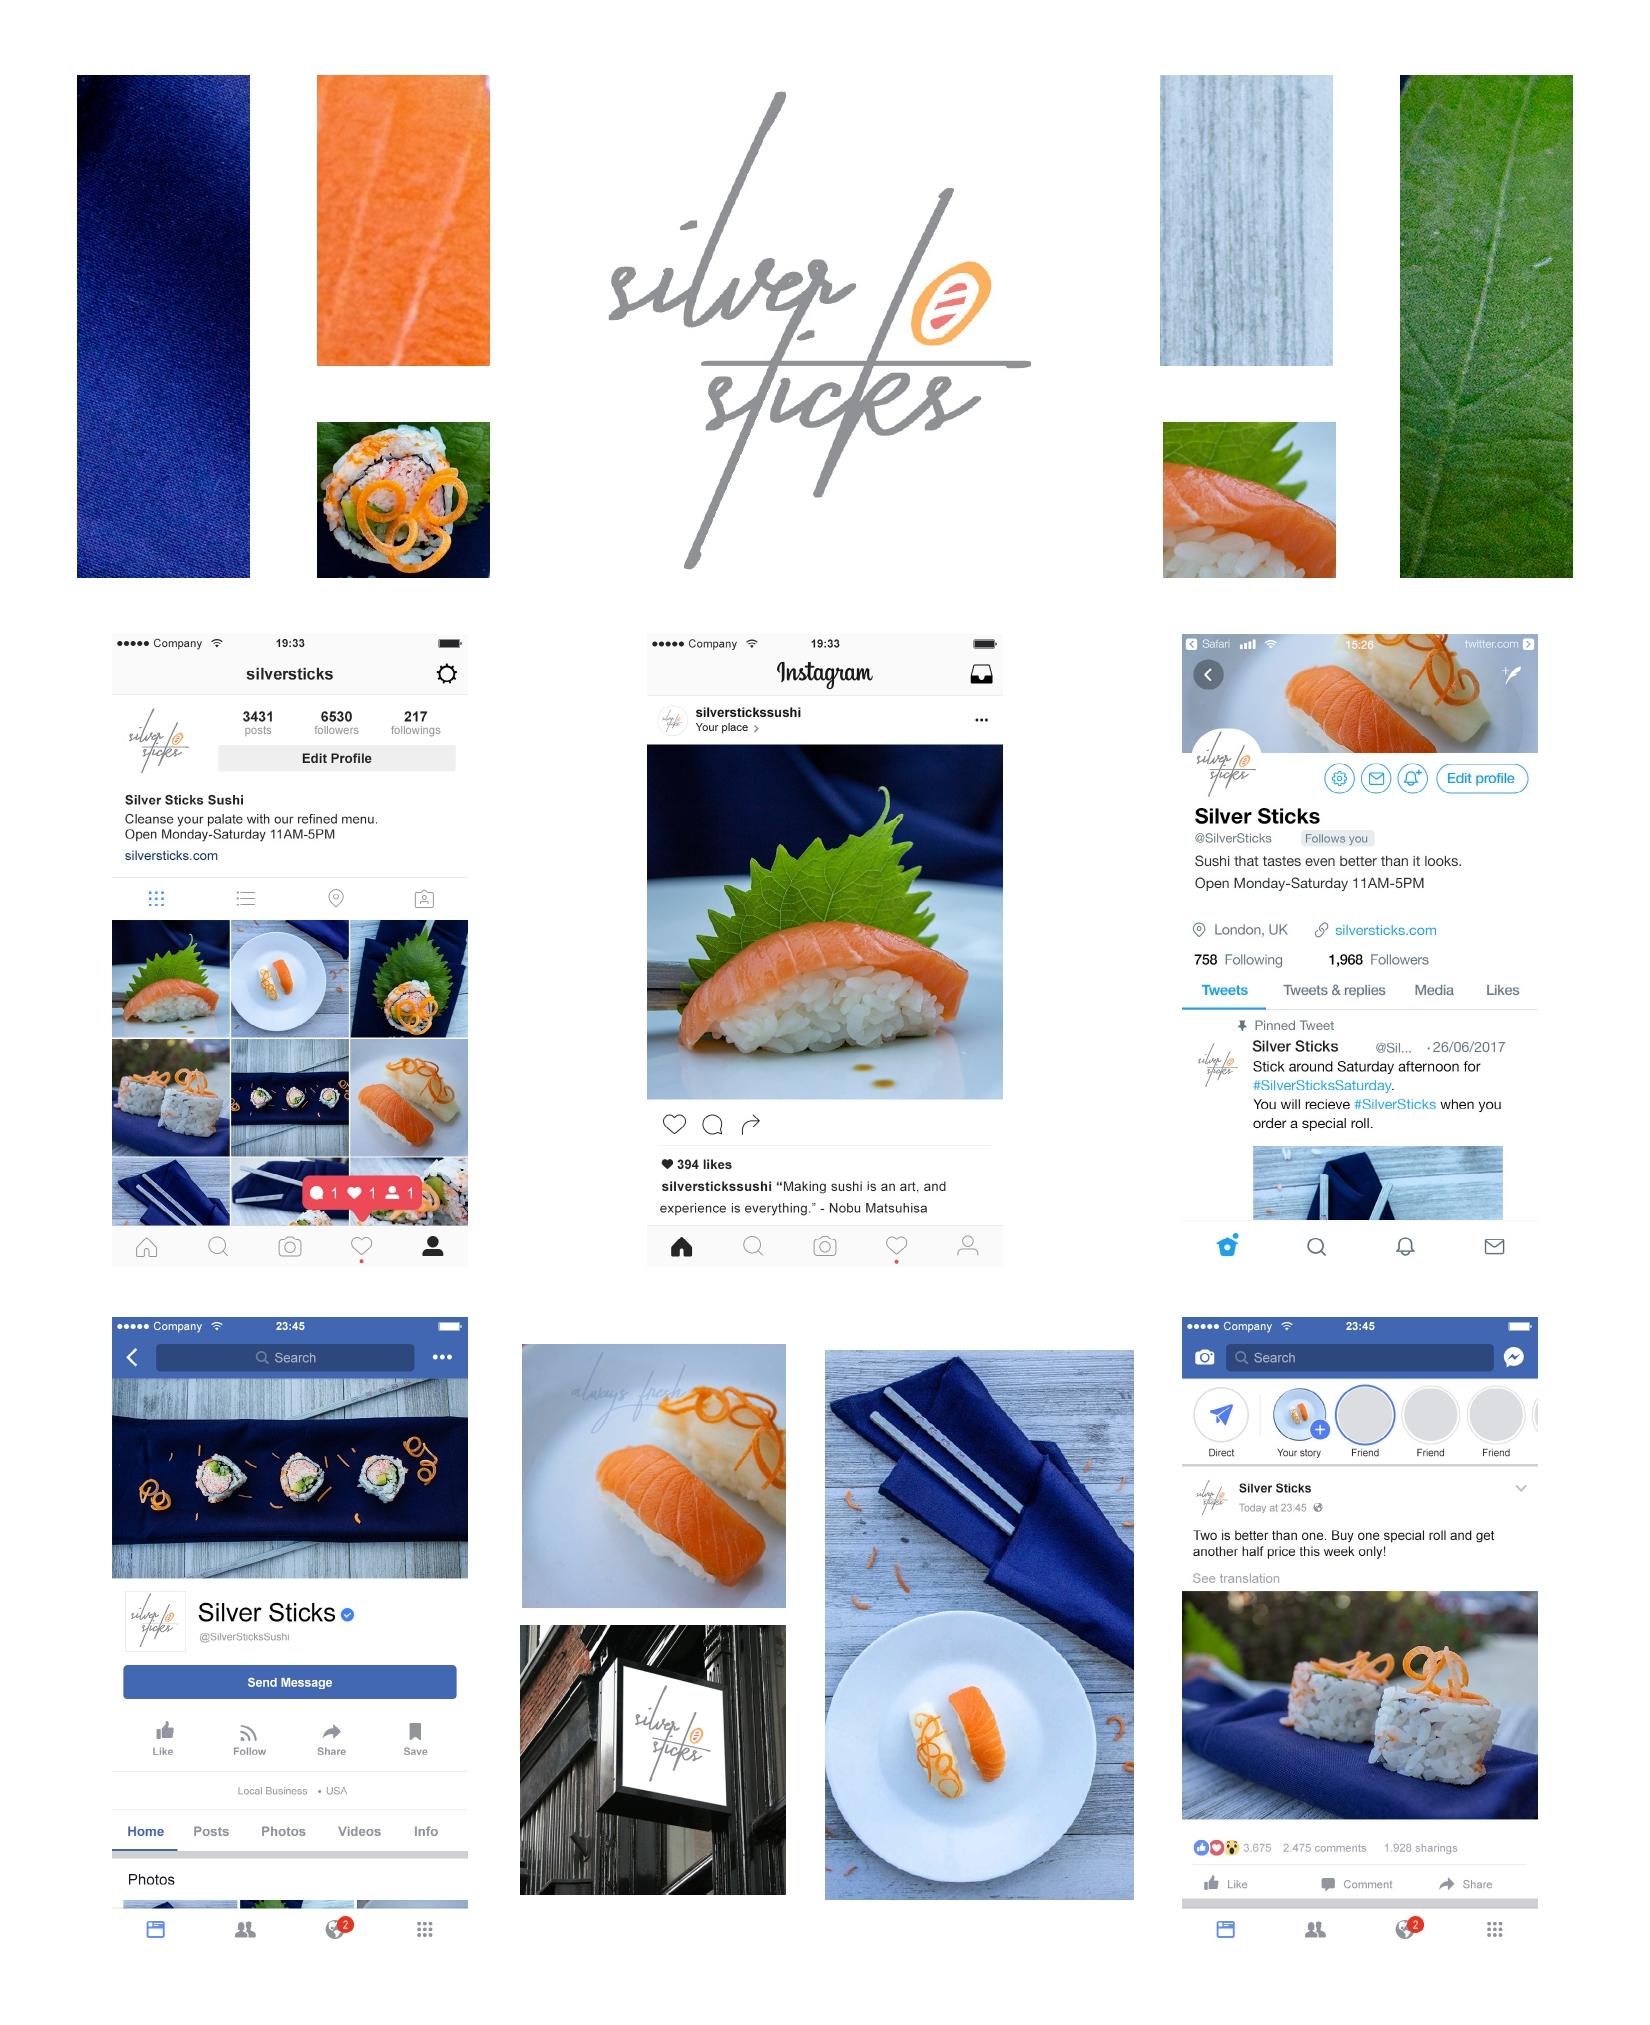 Silver Sticks Sushi